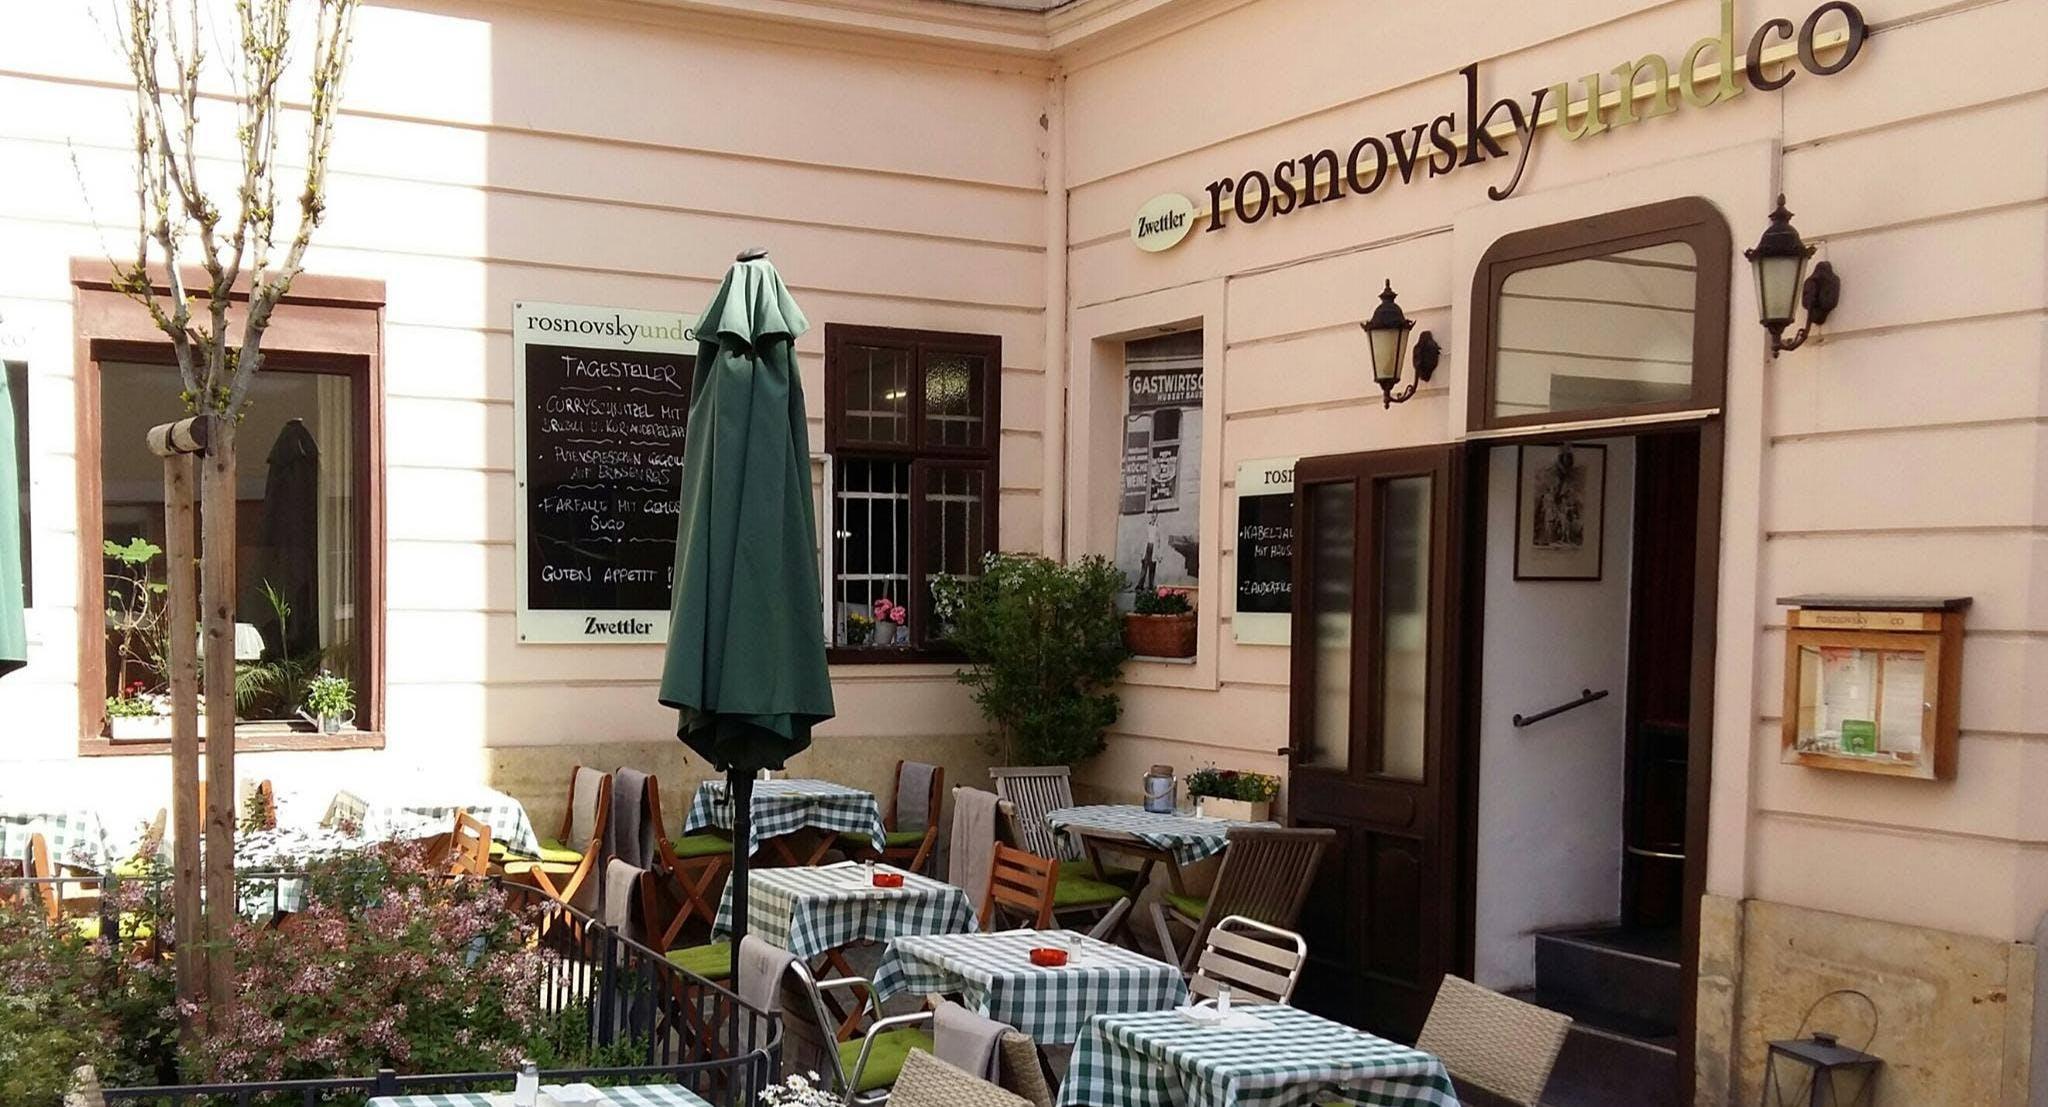 Rosnovsky und co Wien image 1